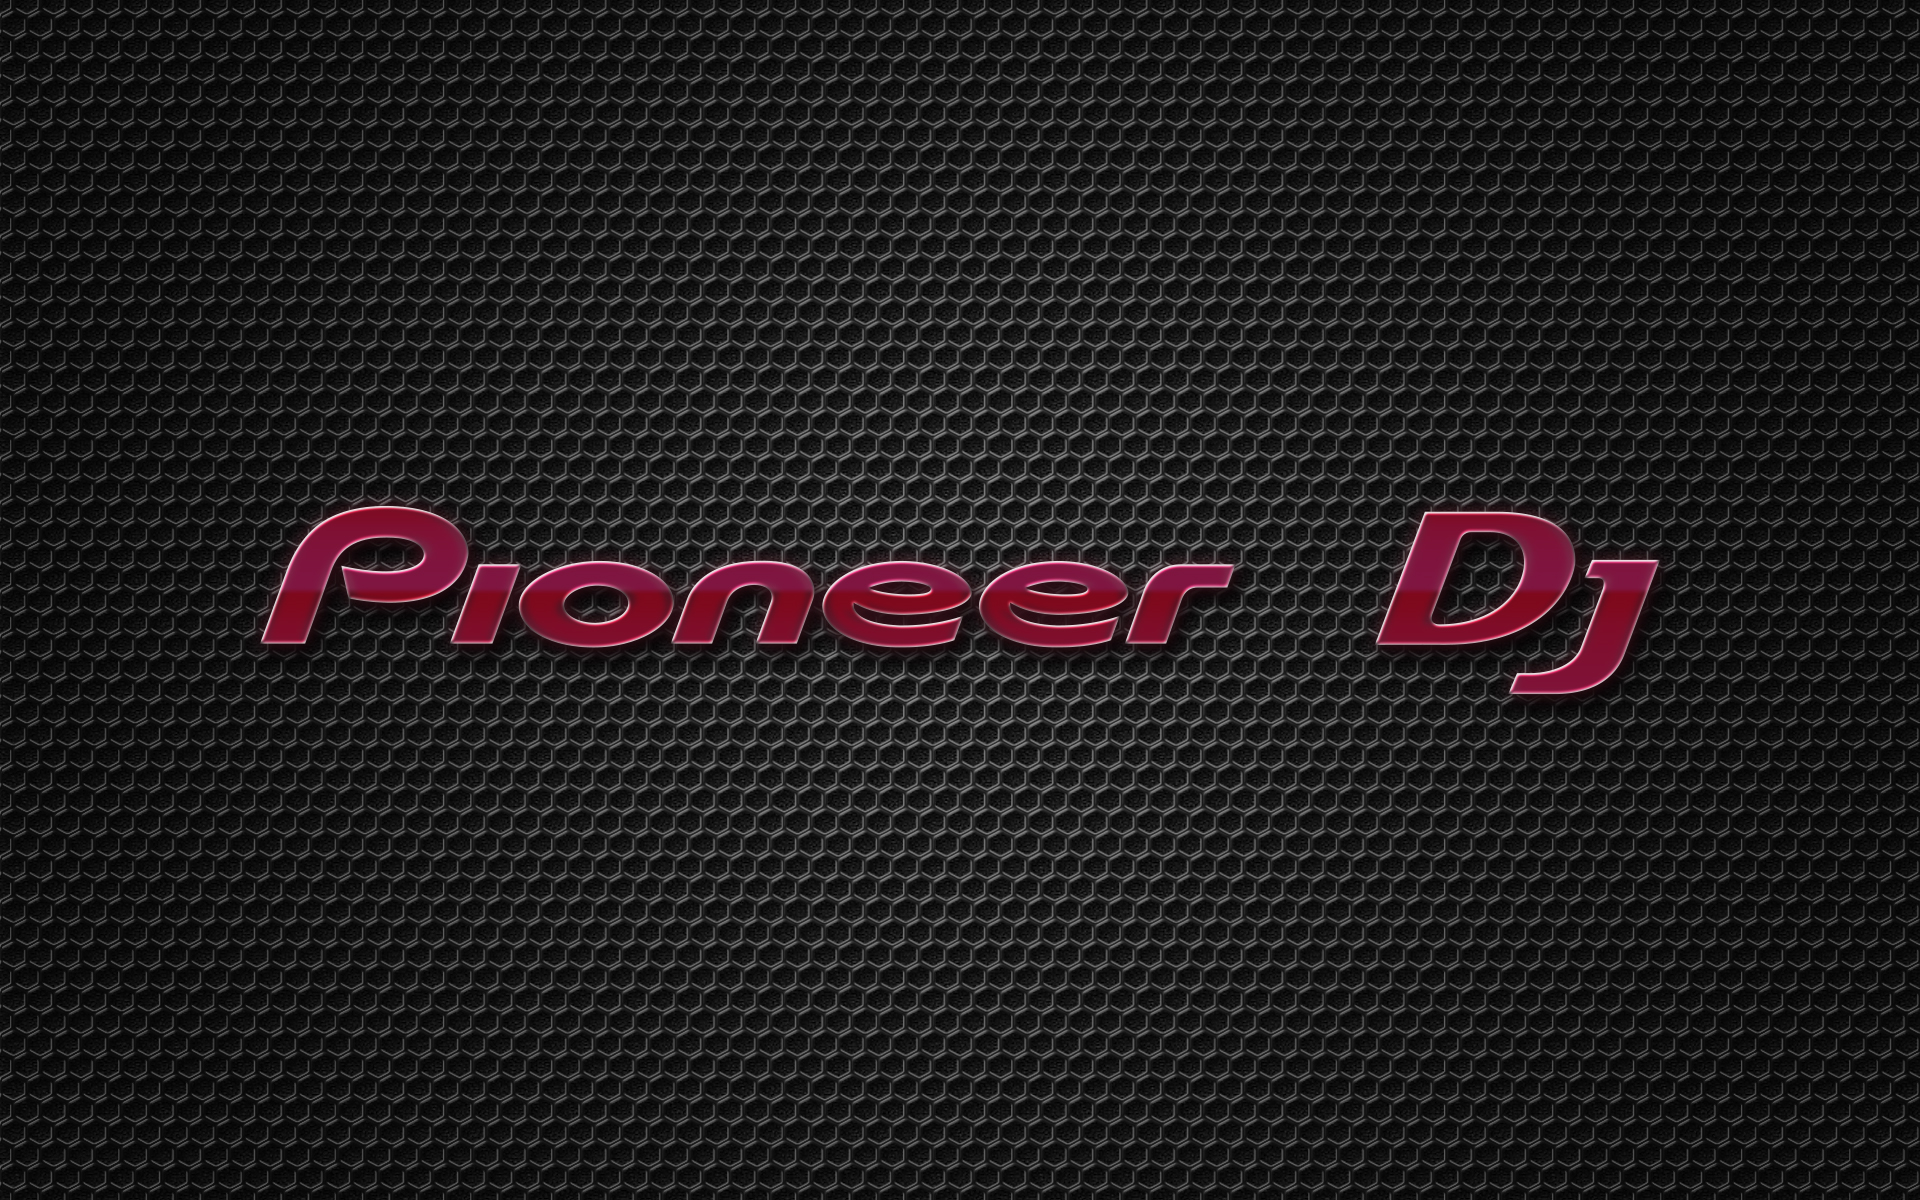 Pioneer Dj Wallpaper Related Keywords amp Suggestions 1920x1200